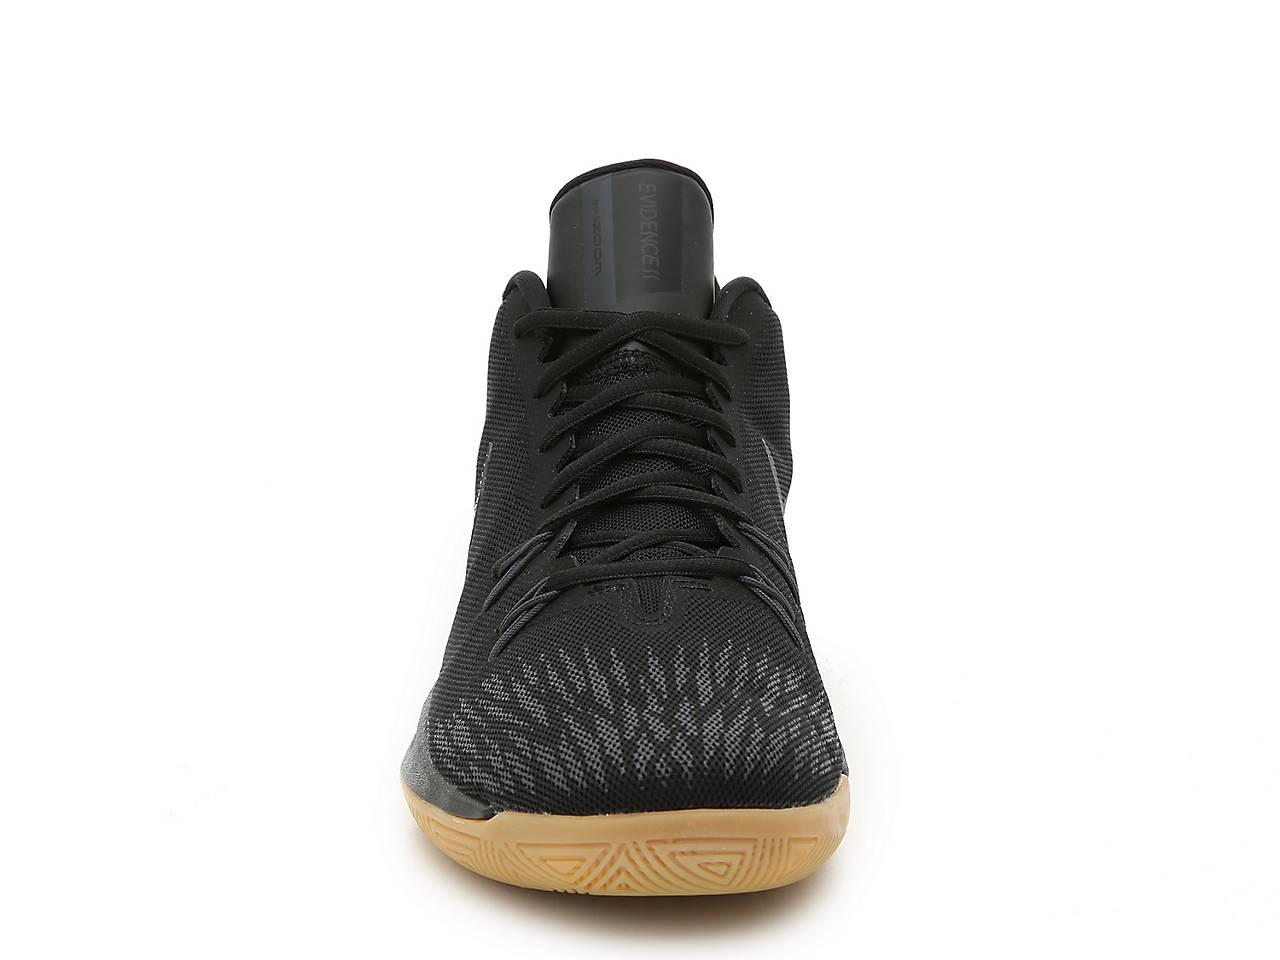 aca68ef8984a9 Nike Zoom Evidence II Basketball Shoe - Men s Men s Shoes